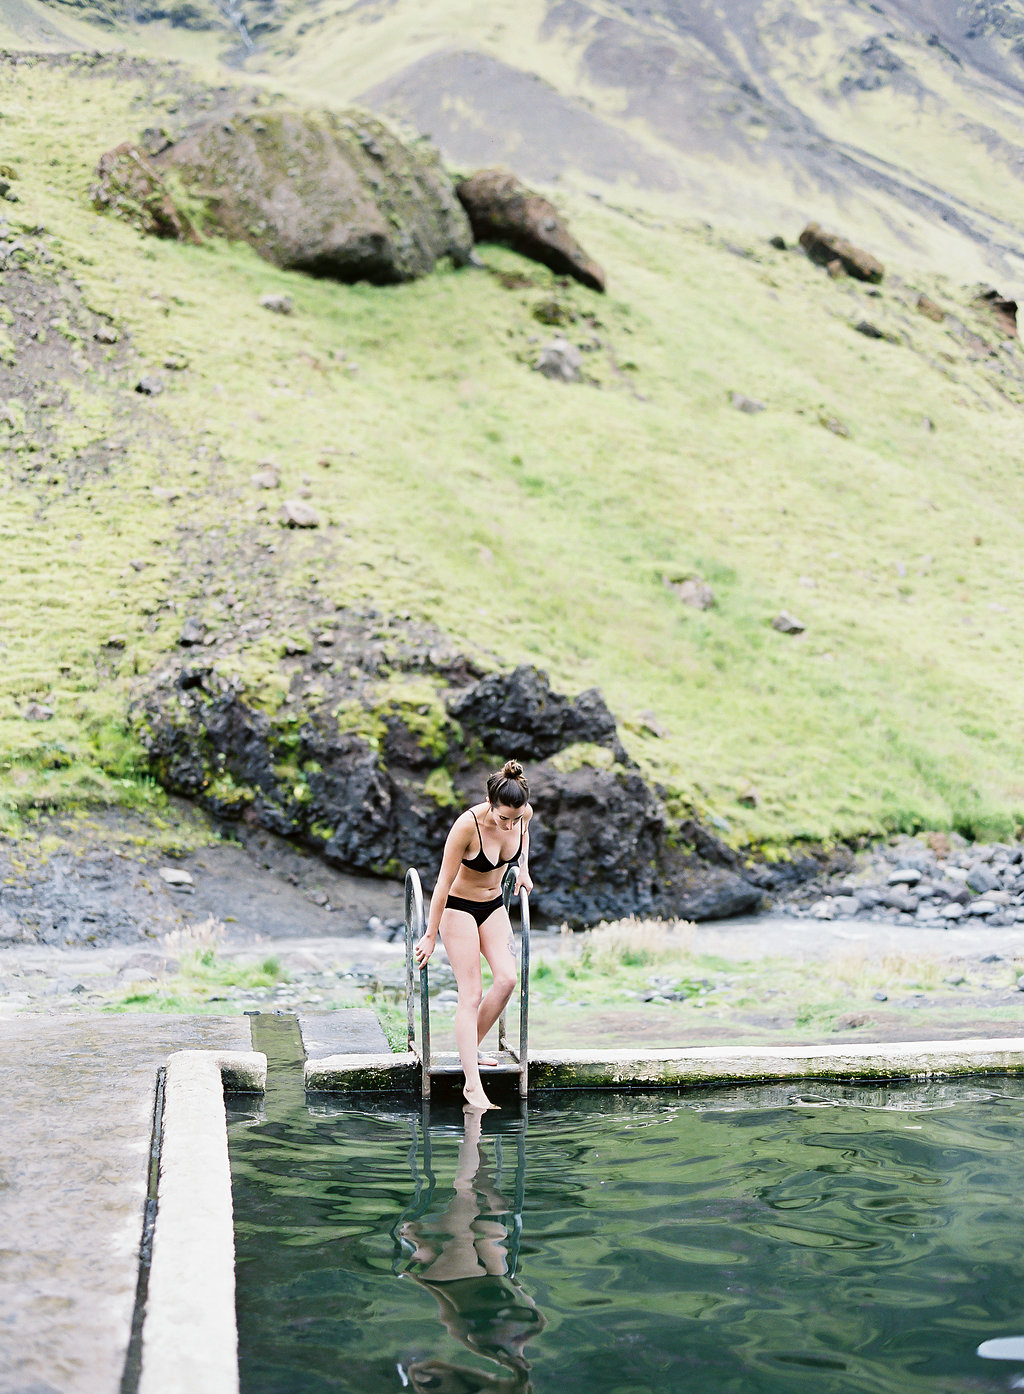 Vicki_Grafton_Photography_Iceland_-53.jpg